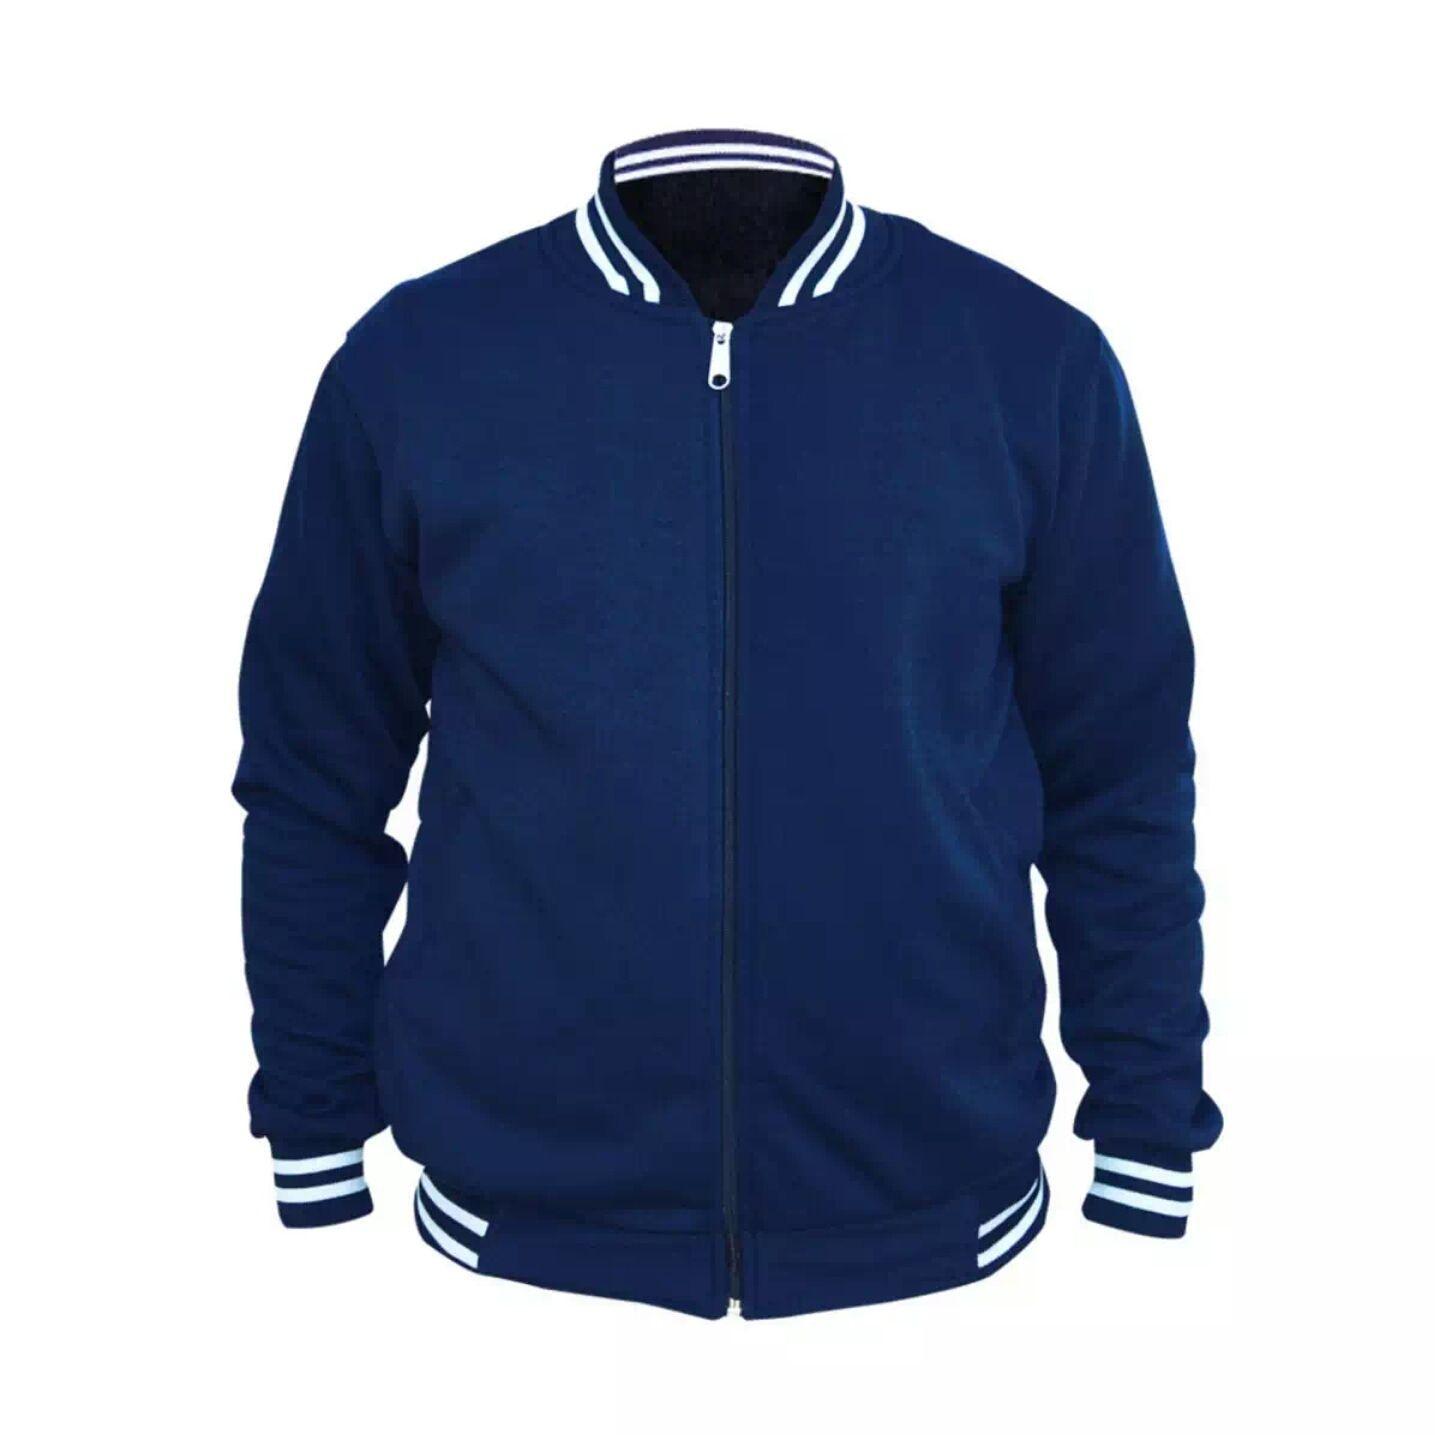 Jaket Sweater Baseball Varsity Polos Navy Cocok Buat Anak Muda Hoodie Zipper Laki